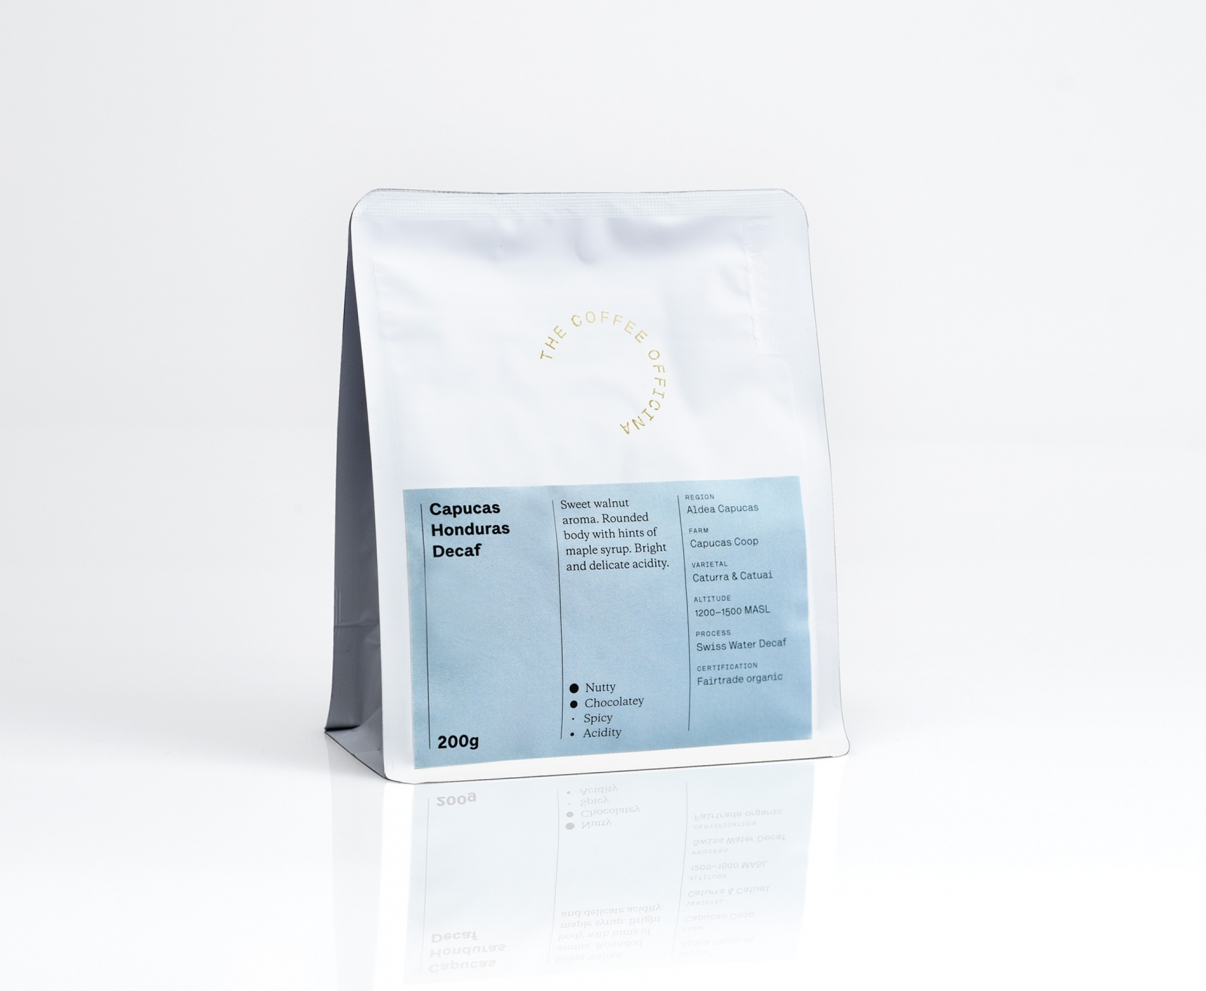 The Coffee Officina Capucas Honduras Swiss Water Decaf Single Origin